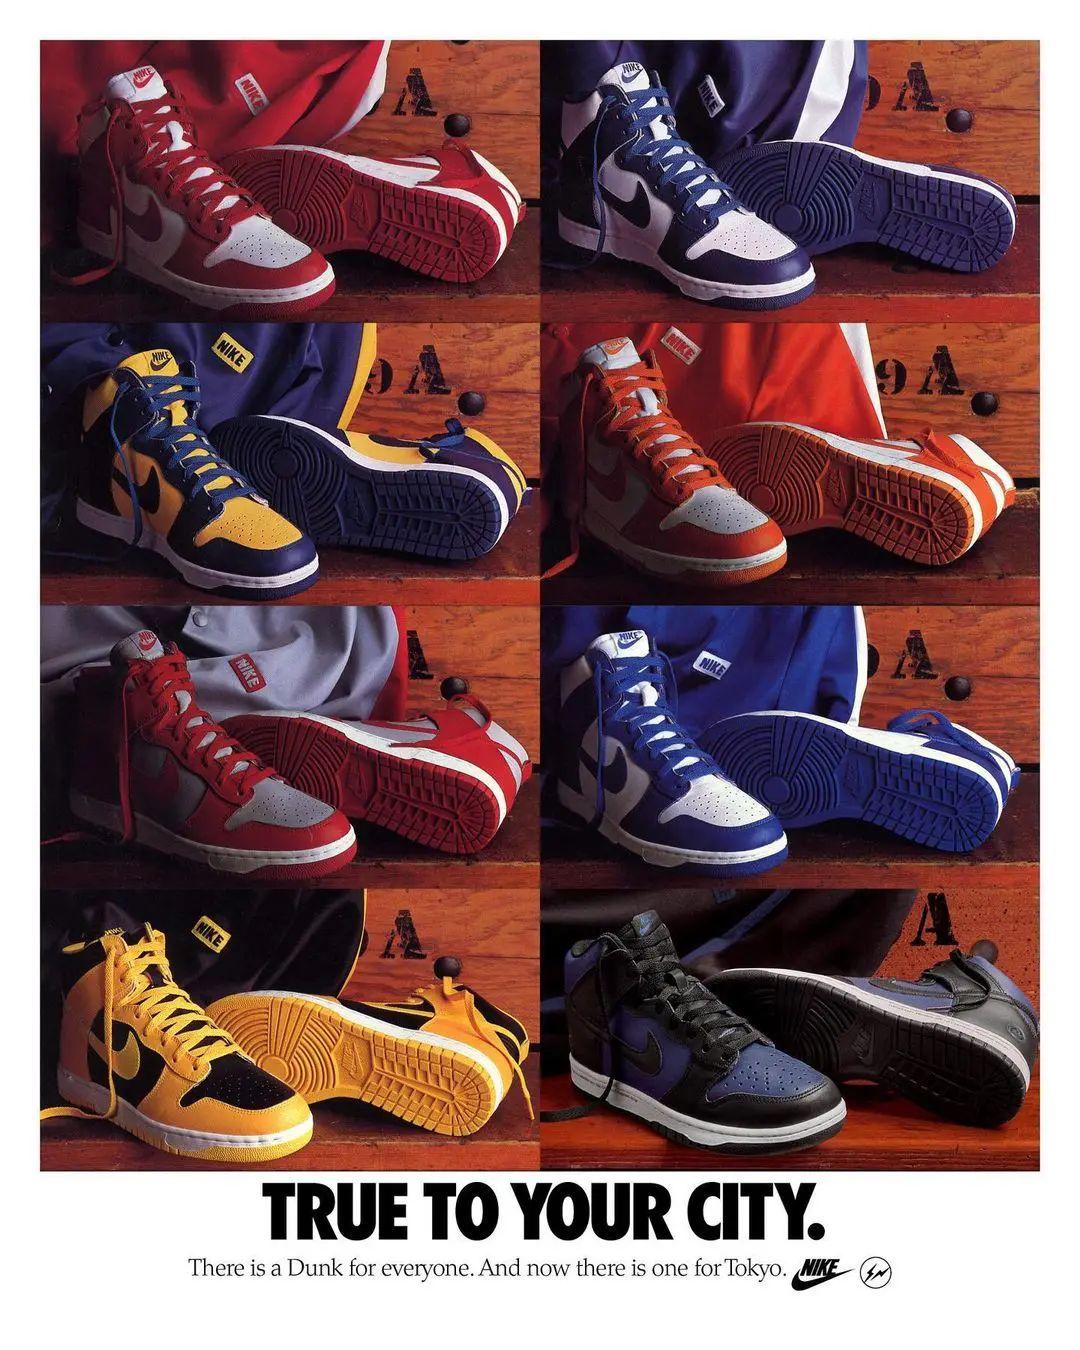 Nike,Dunk High,fragment design  藤原浩亲晒!全新 fragment design x Dunk High Tokyo 实物曝光!